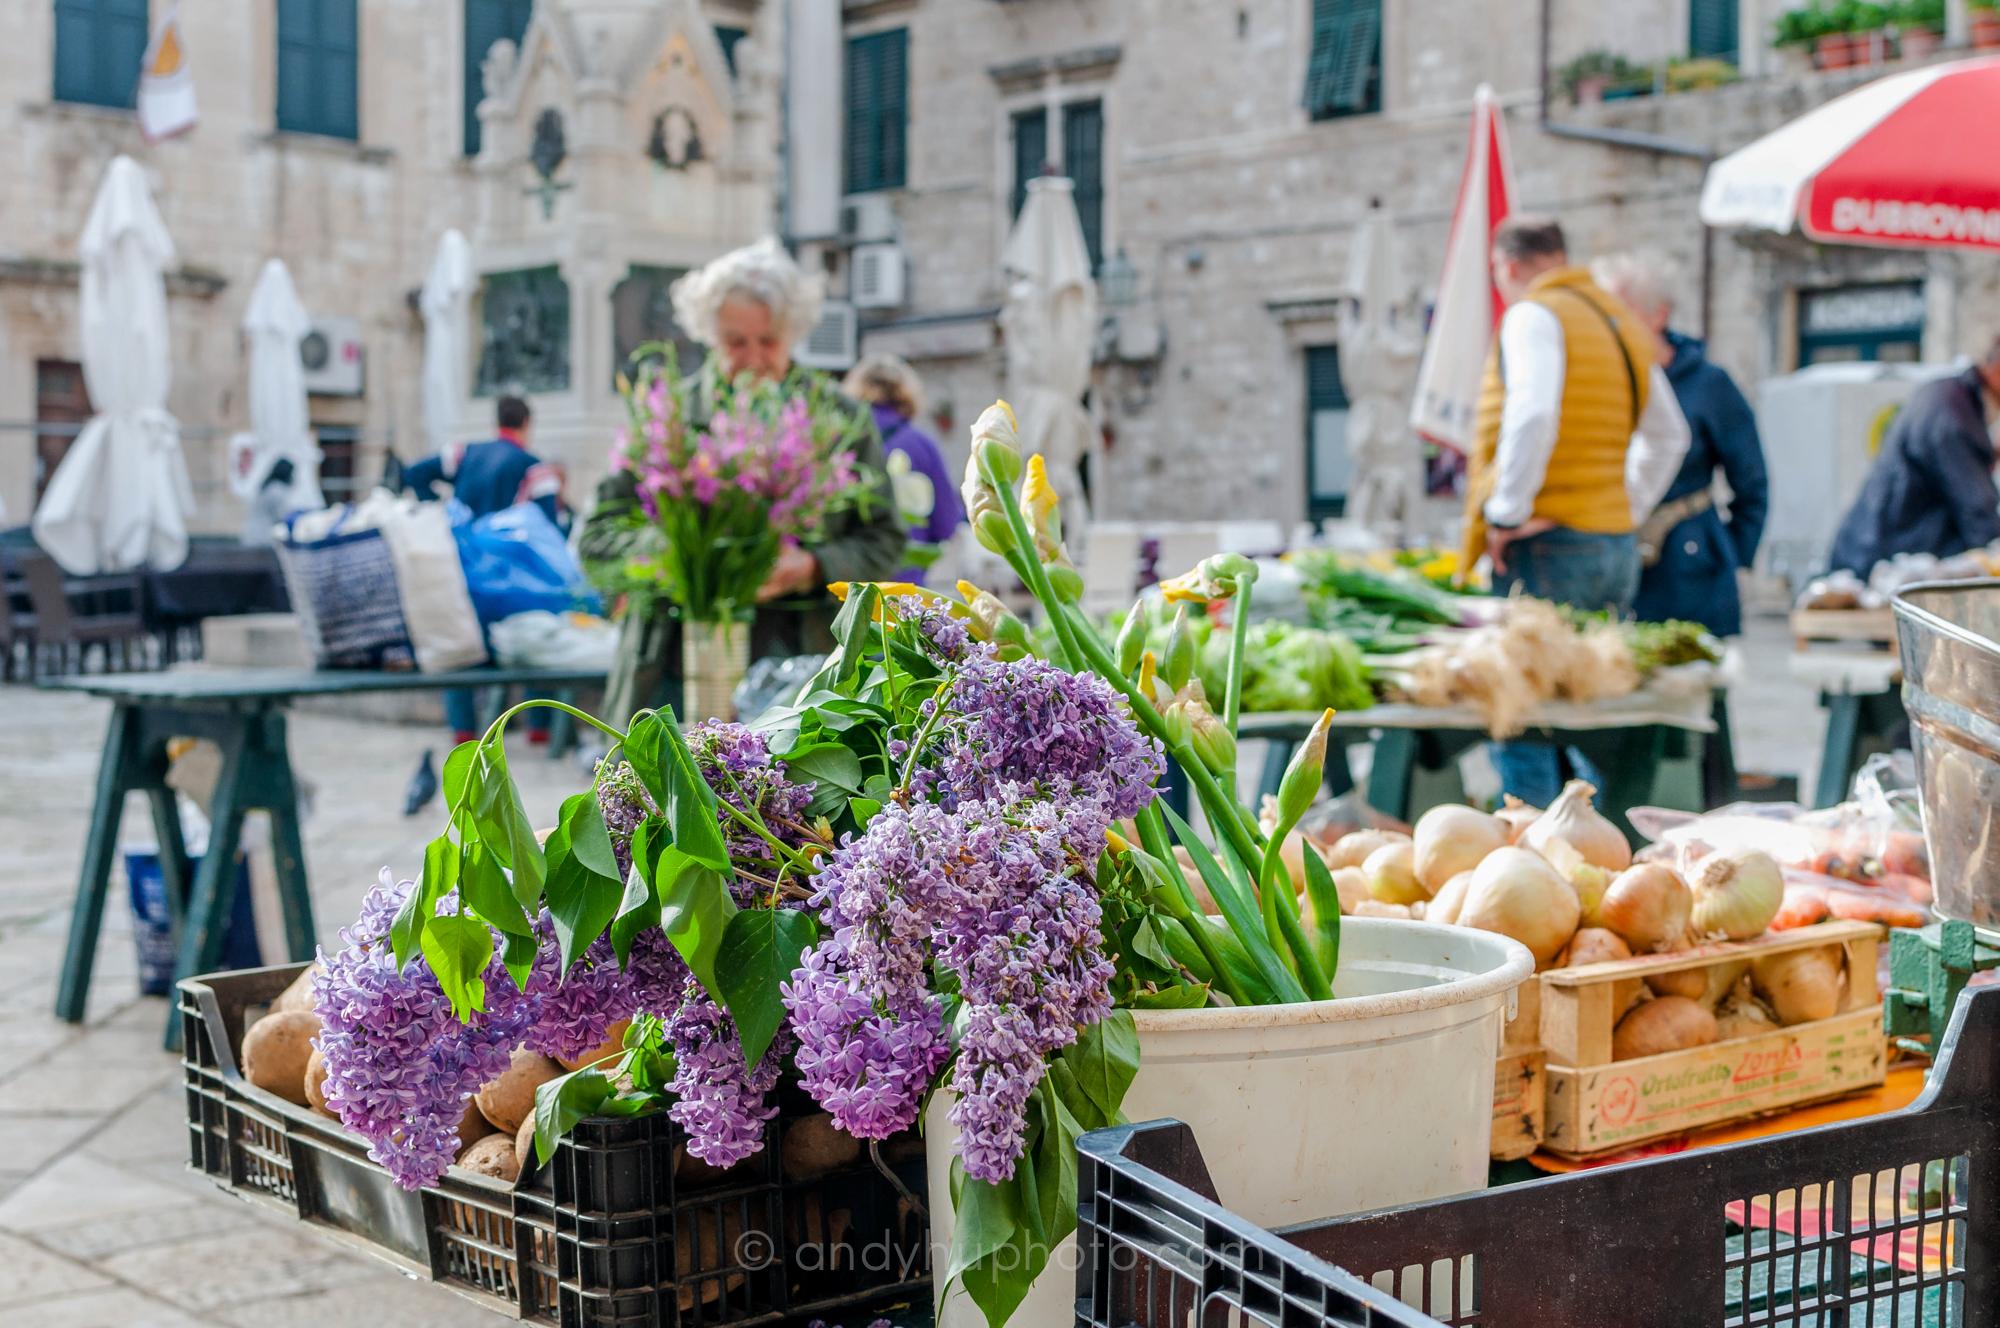 Morning Market at Gundulic Square in Dubrovnik Grad